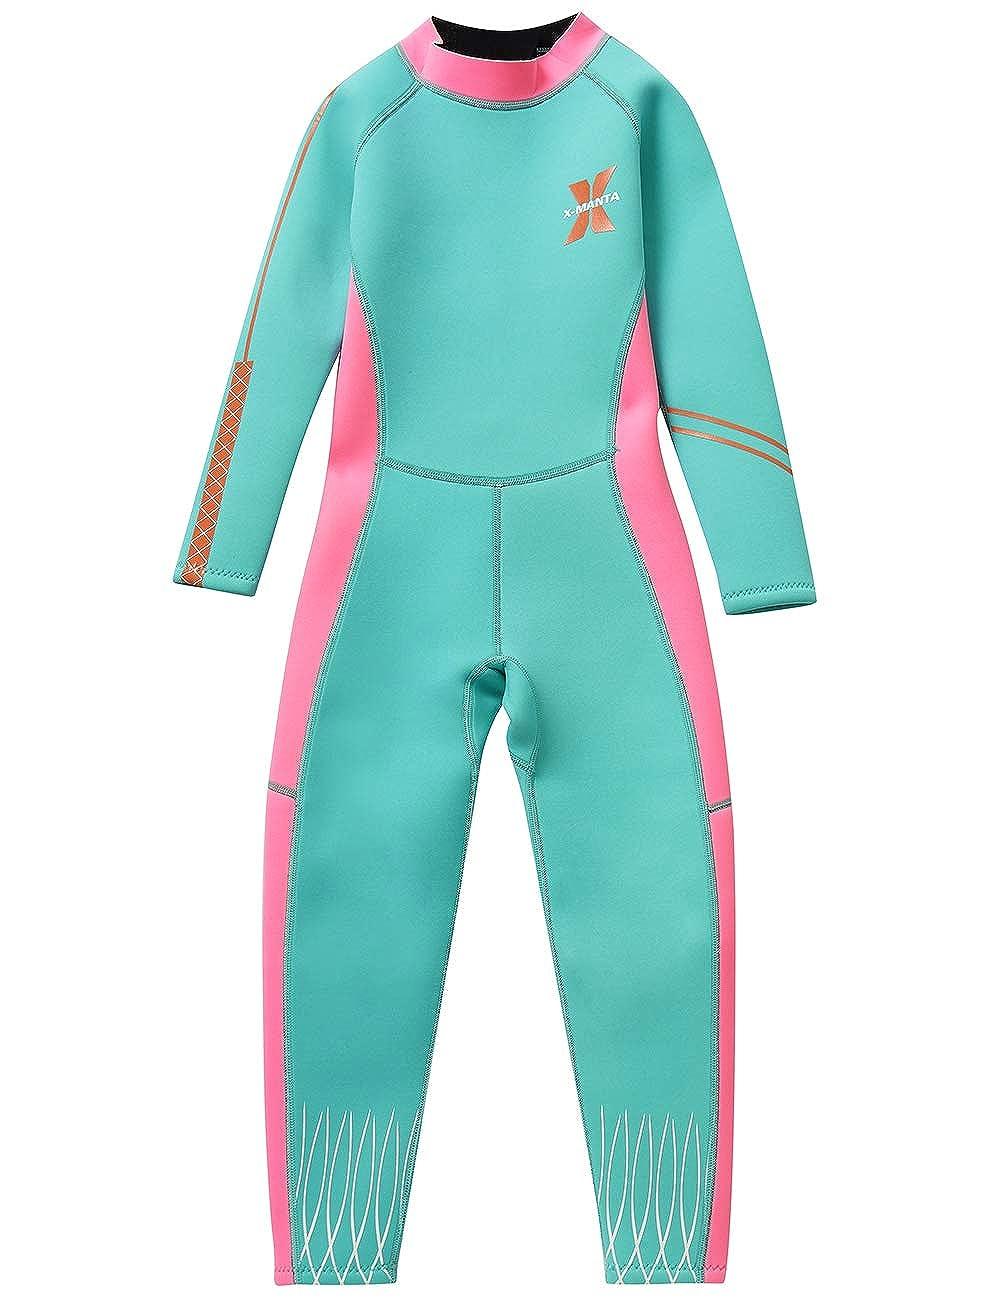 9952963488 Gogokids Kids Wetsuit Boys Girls Rash Guard One Piece Neoprene Swimsuits  Boys